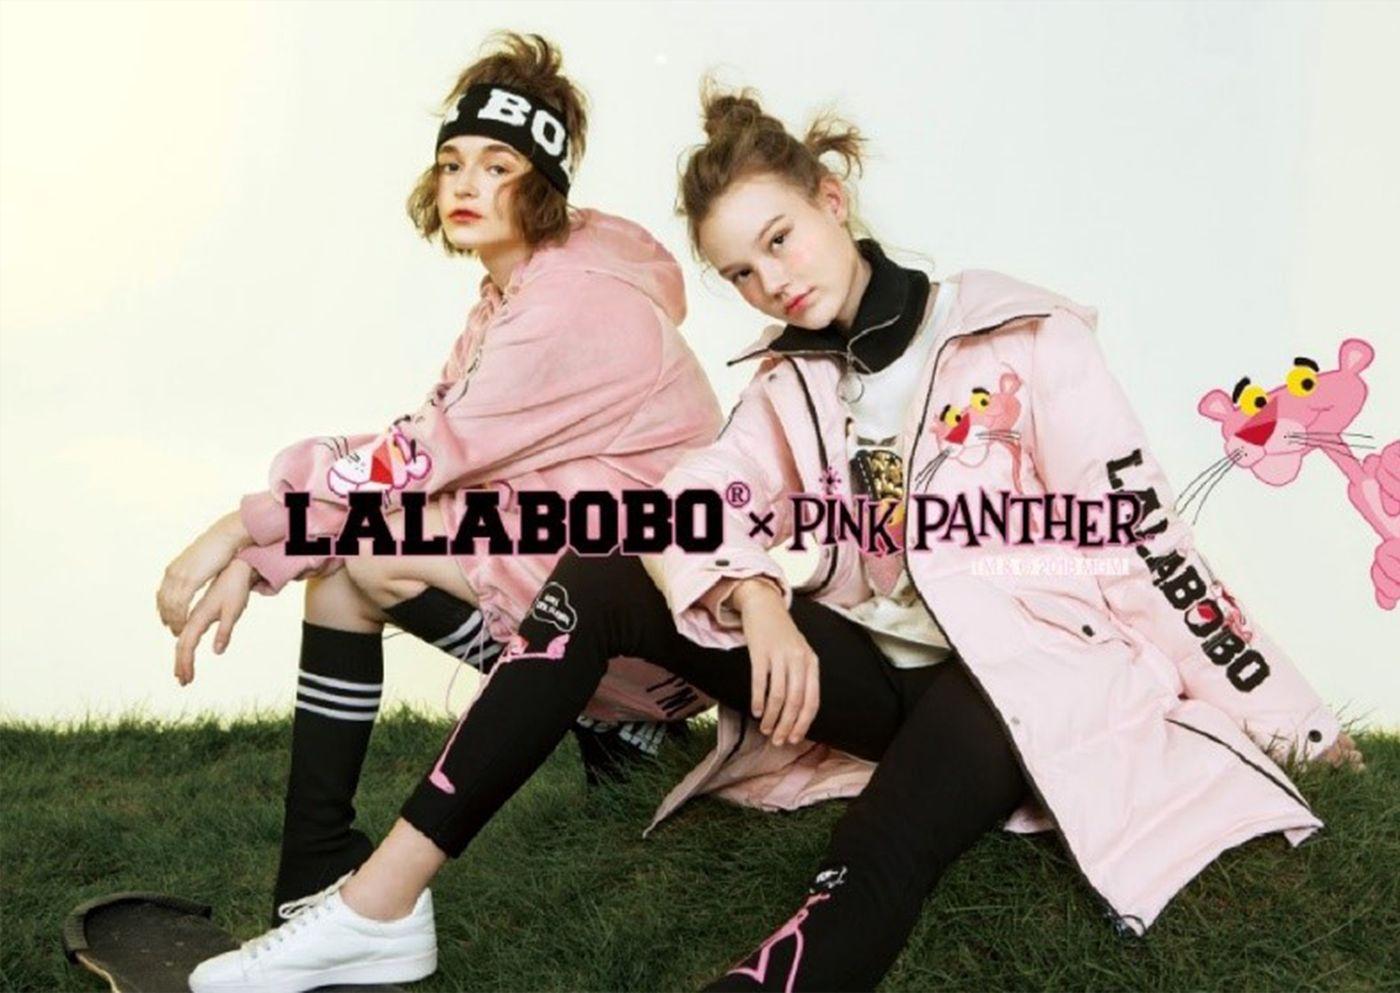 Pink Panther x Lalabobo